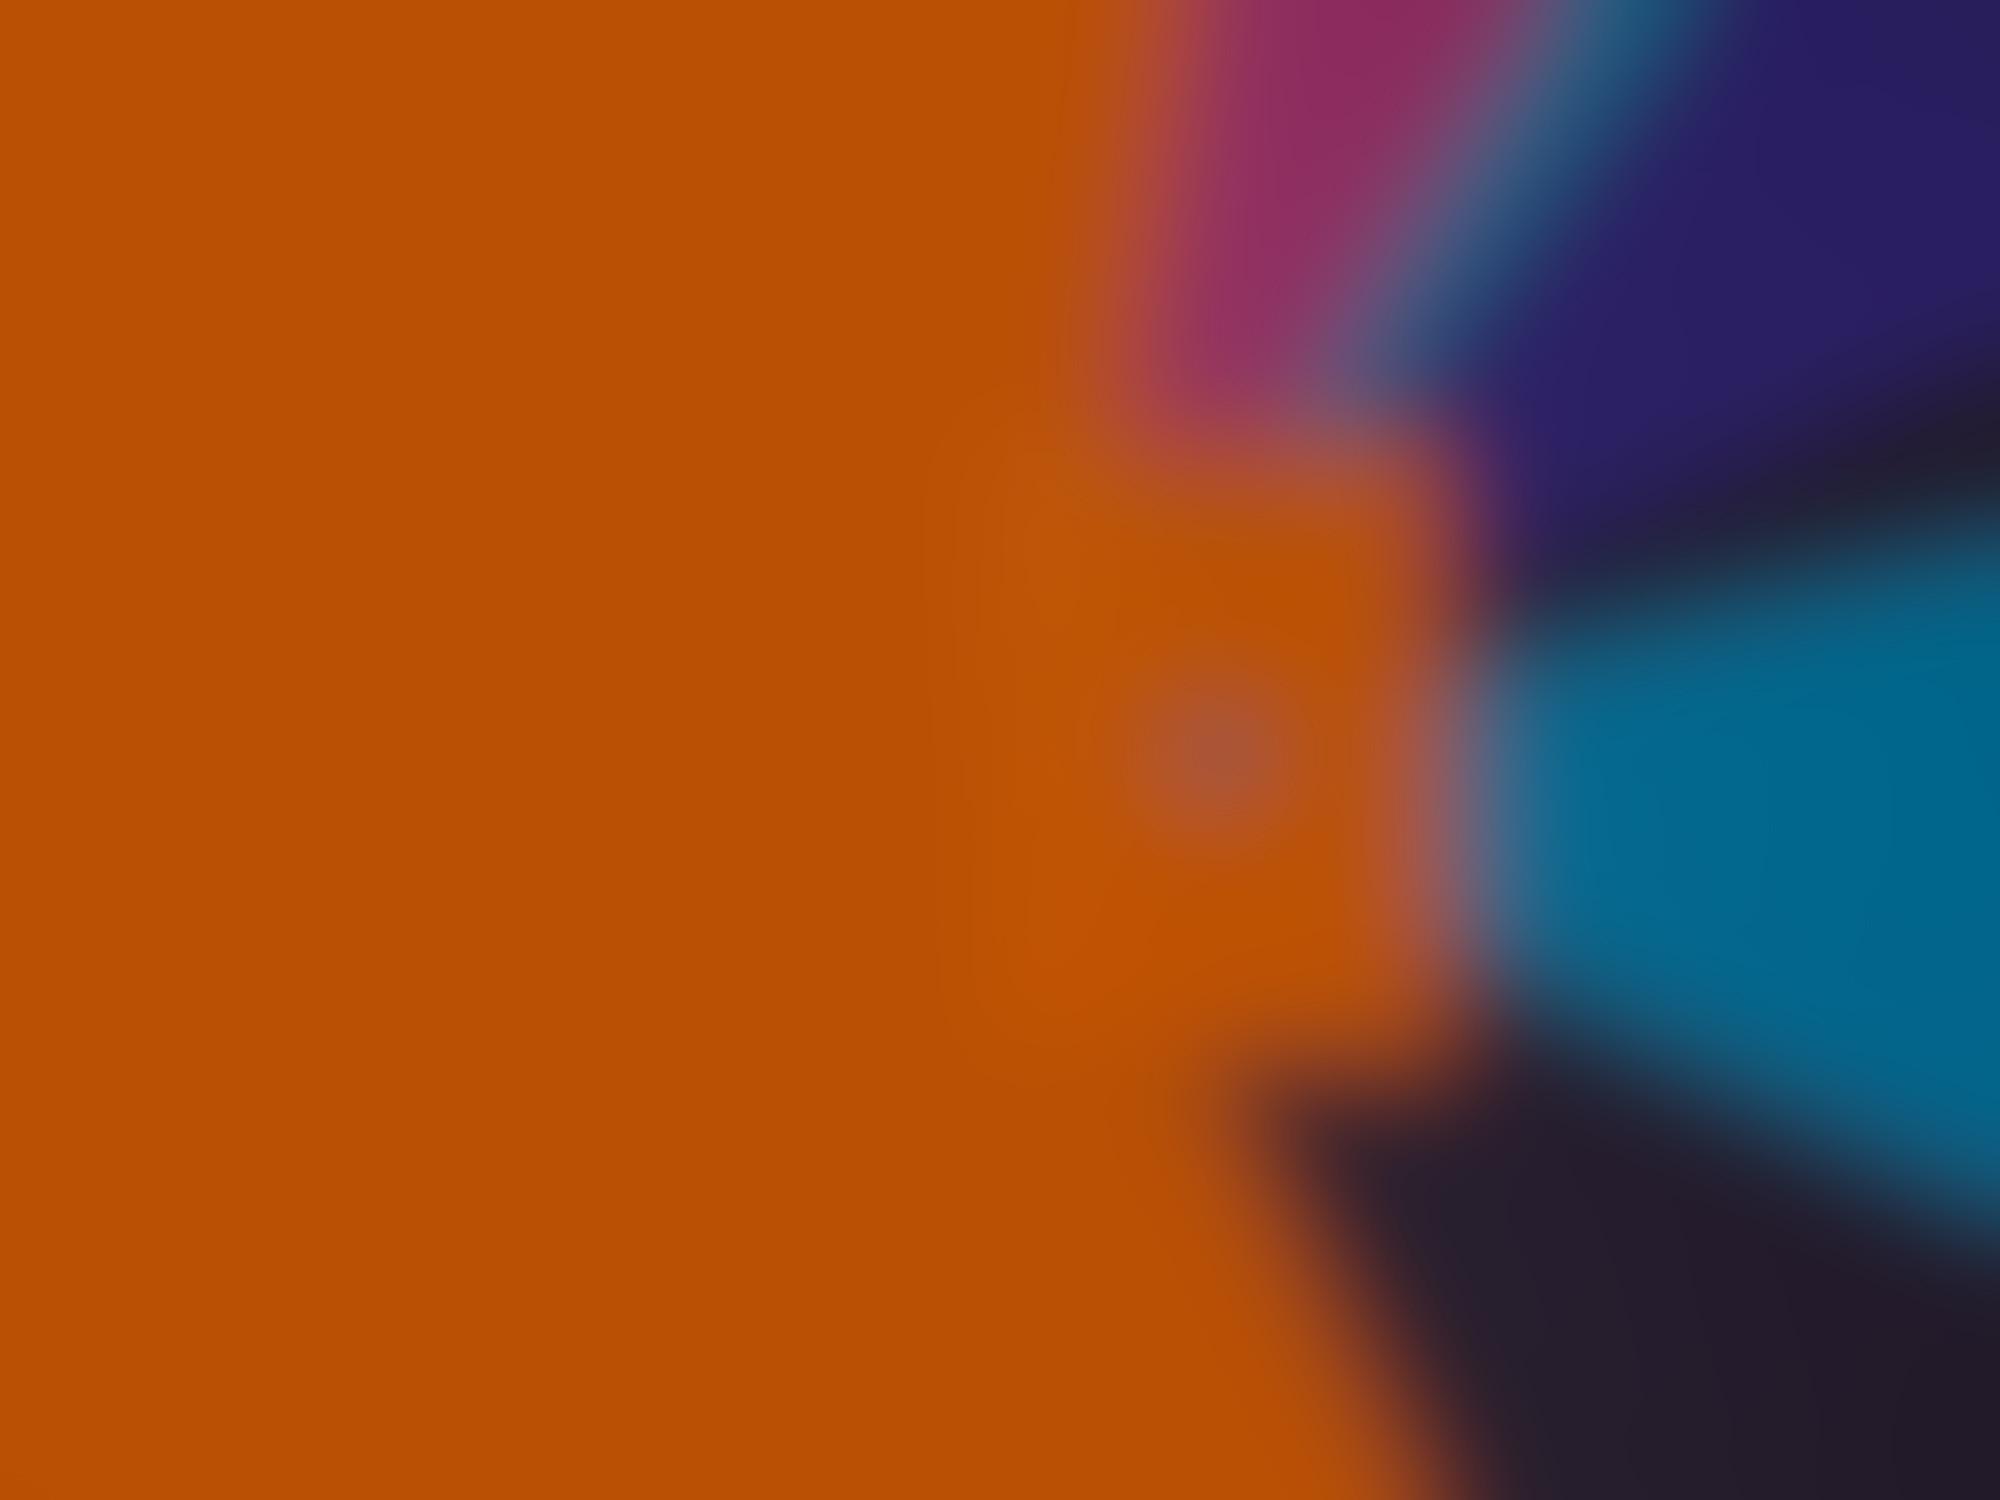 Colour Directions No 3 High Octane 2016 GF Smith autocompressfitresizeixlibphp 1 1 0max h2000max w3 D2000q80sa5b822502951627633585d087cbfa07a